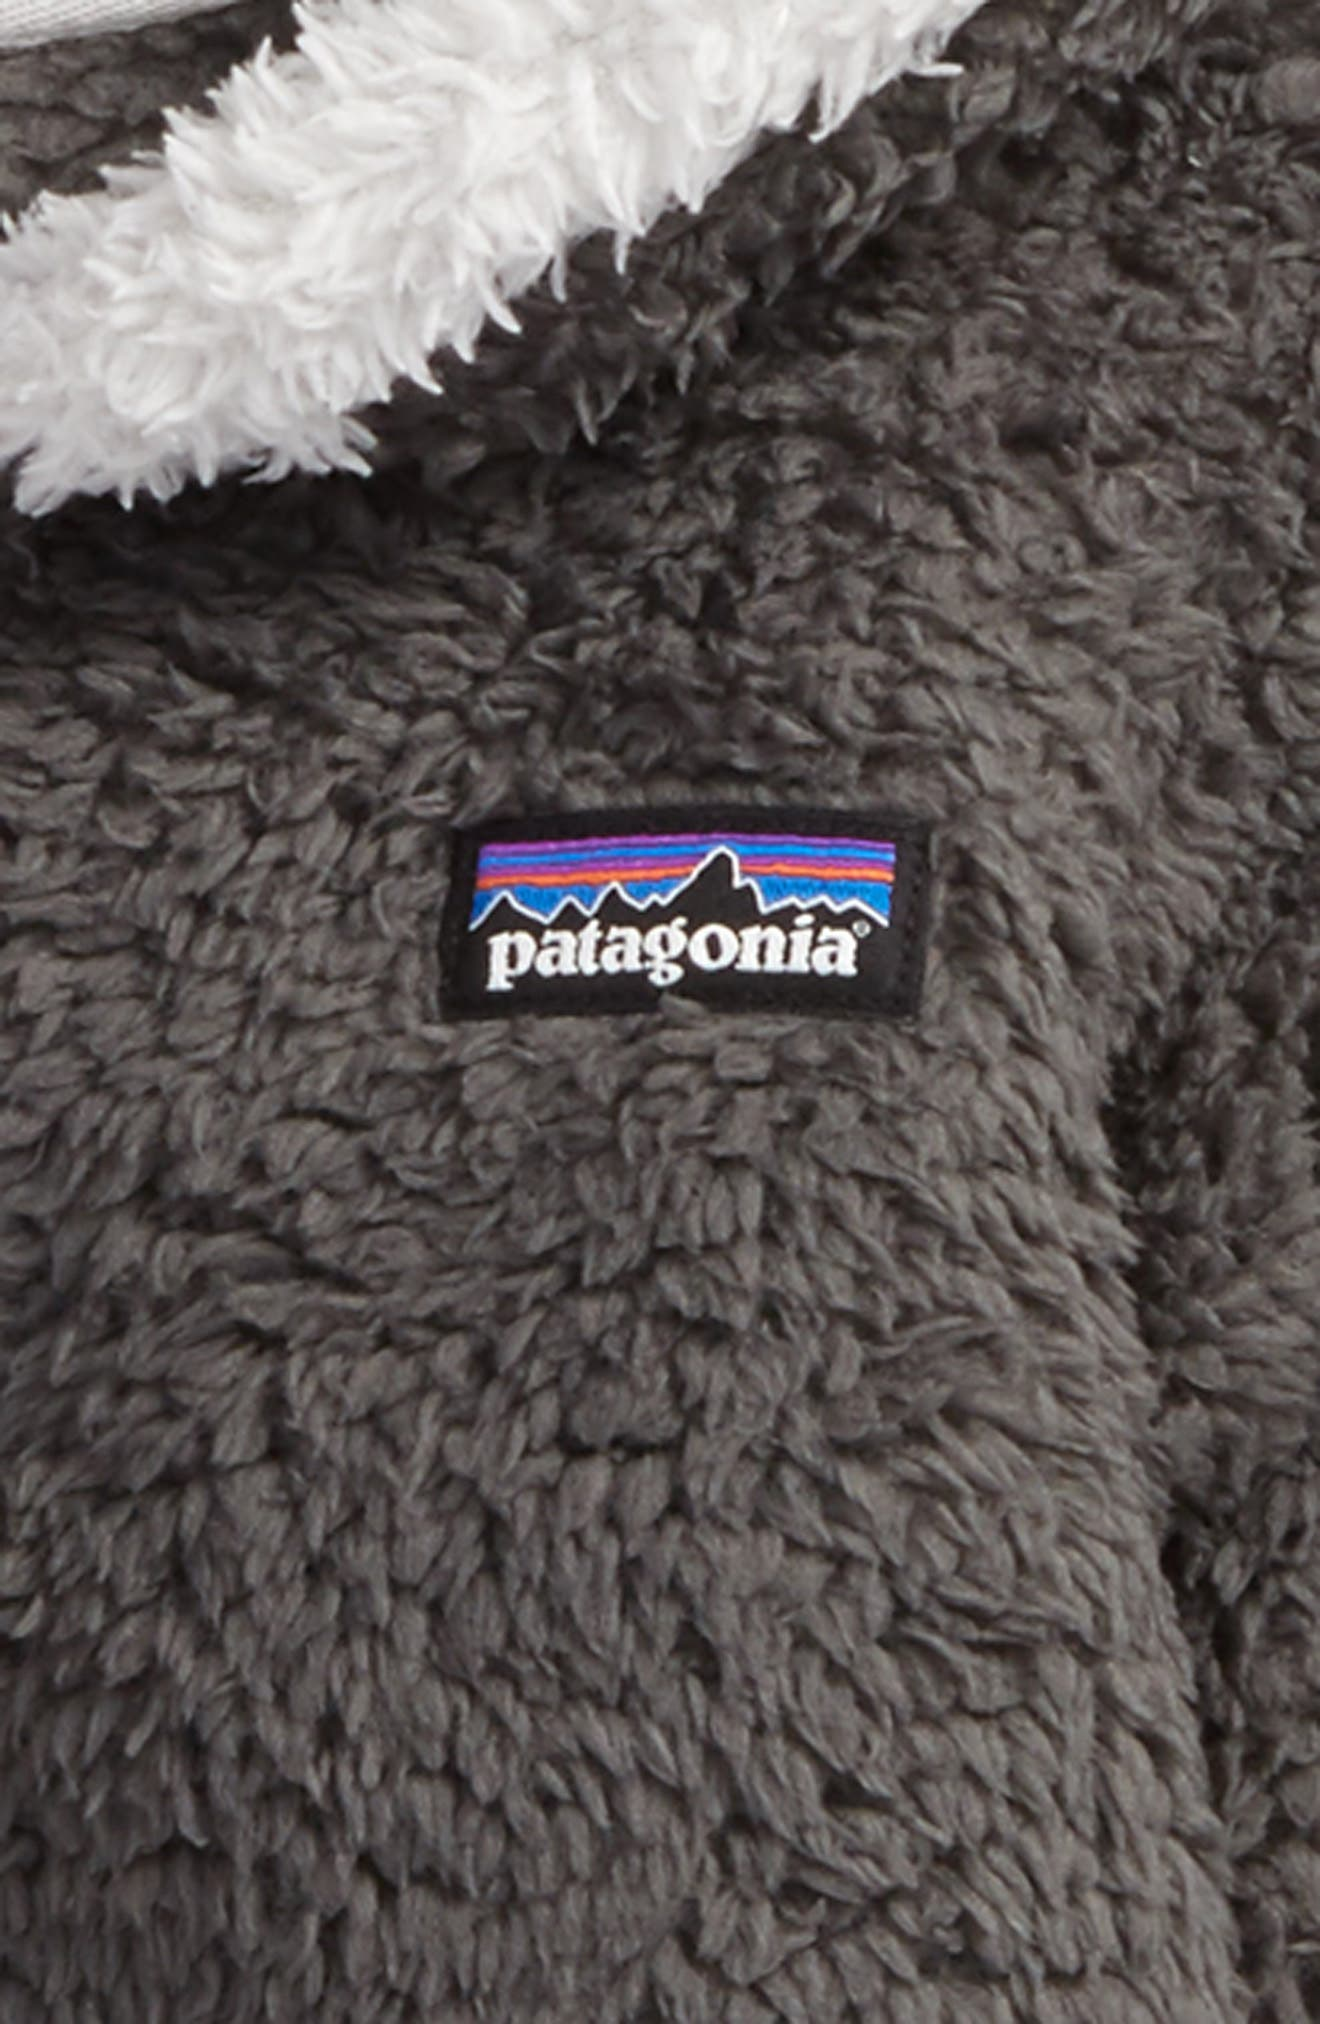 PATAGONIA,                             Furry Friends Zip Hoodie,                             Alternate thumbnail 2, color,                             FORGE GREY